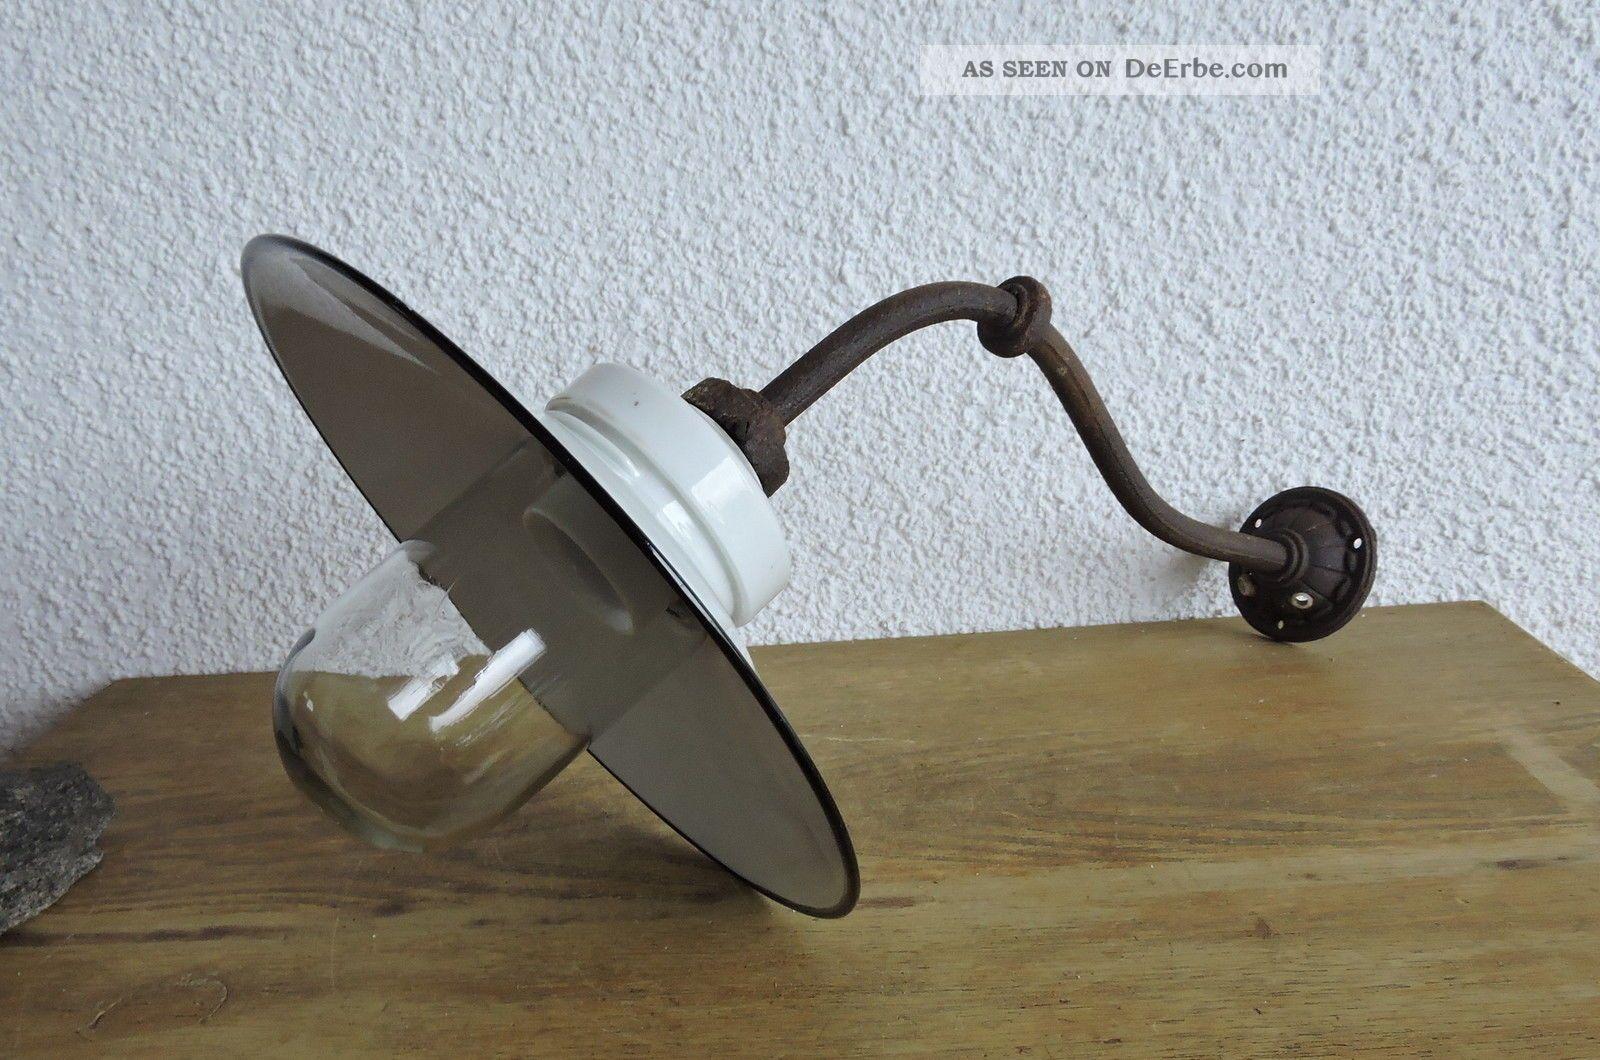 Art Deco Baushaus Lampe Wandlampe Hoflampe Ausleger Glaskolben Emailschirm Original, vor 1960 gefertigt Bild